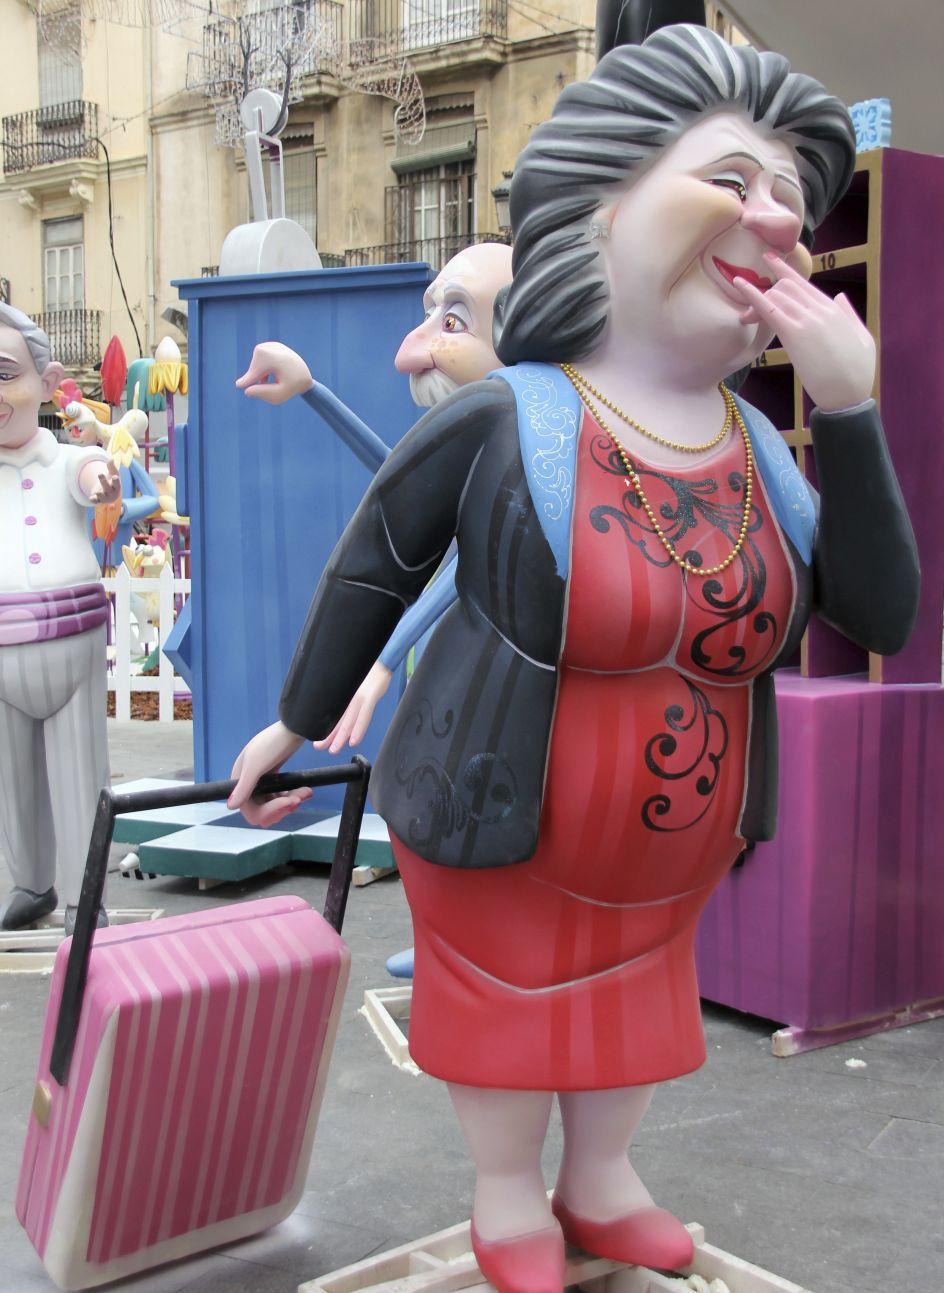 Valencia's 'Fallas' fiesta earns UNESCO heritage status